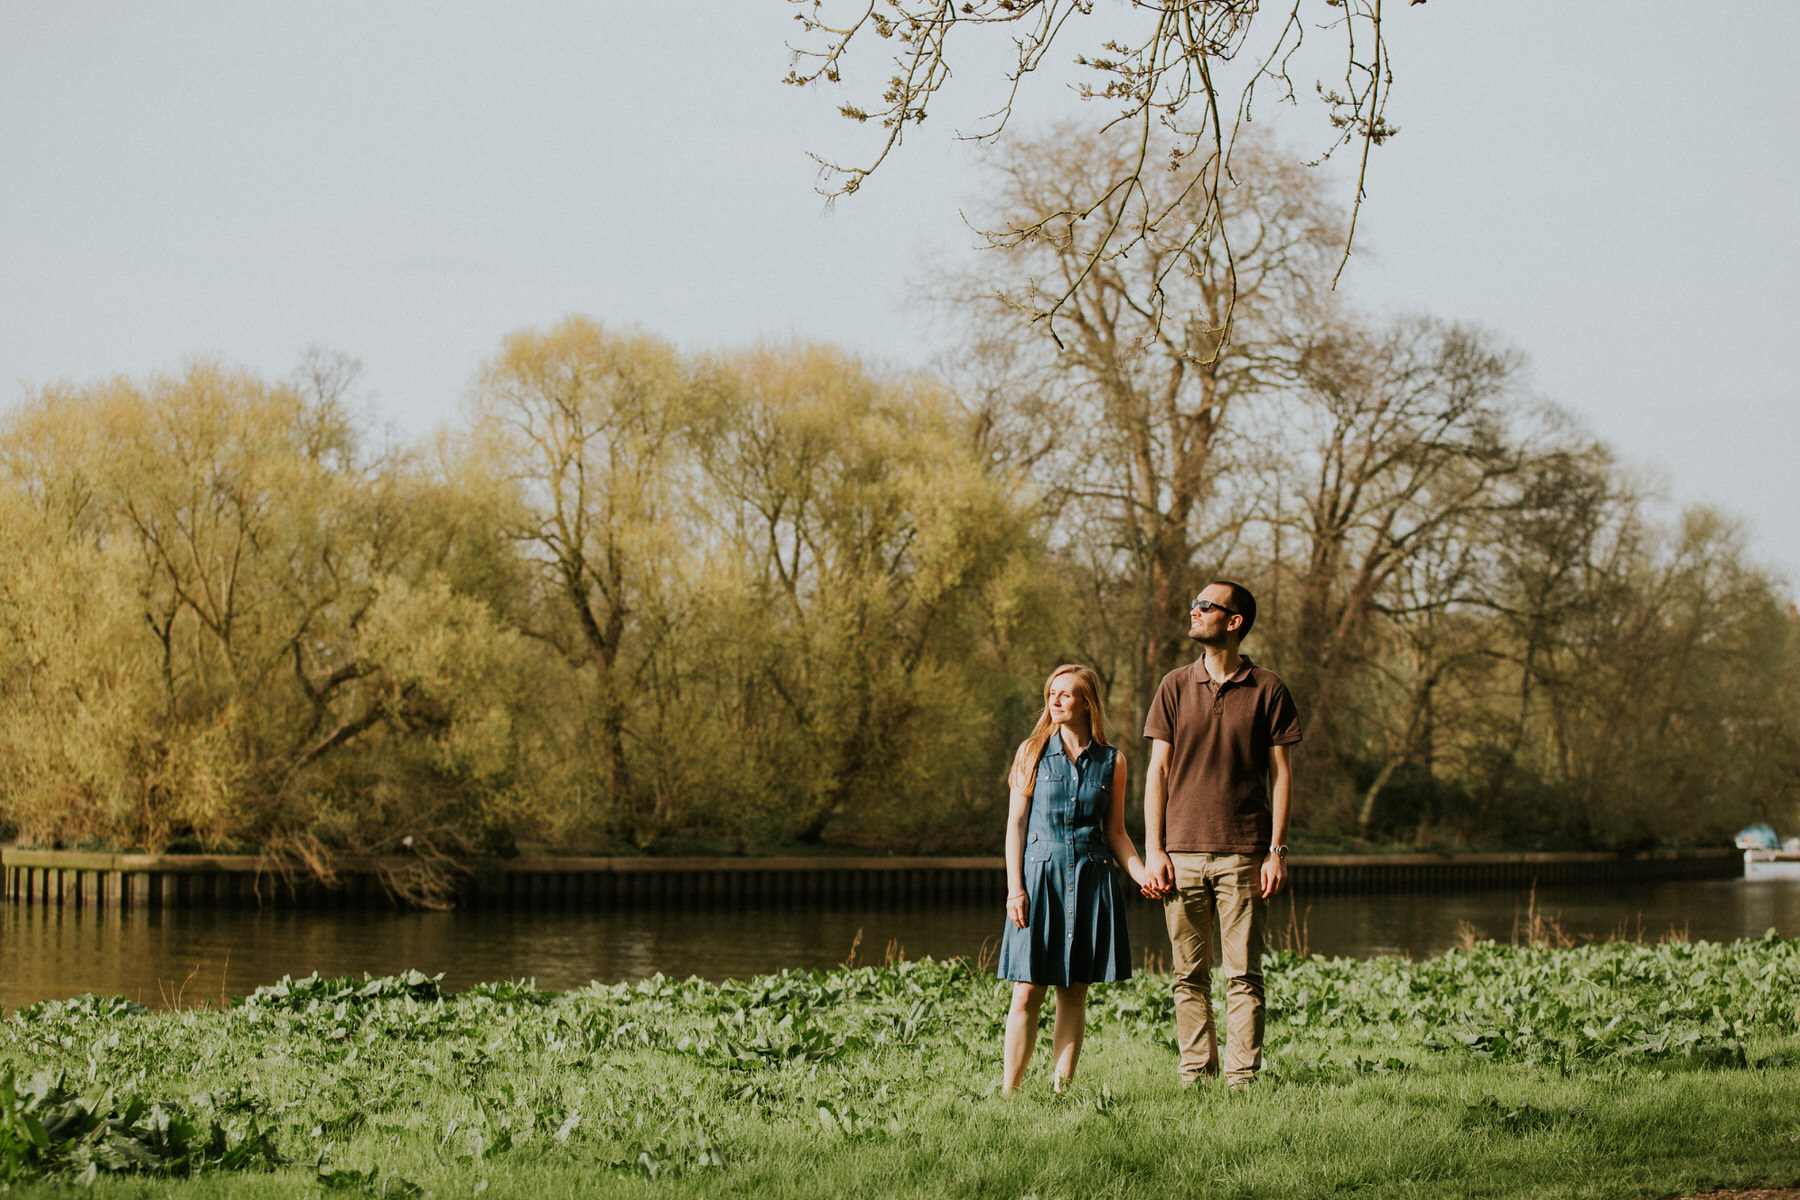 35-Turner painting inspired couple portrait riverside Richmond.jpg